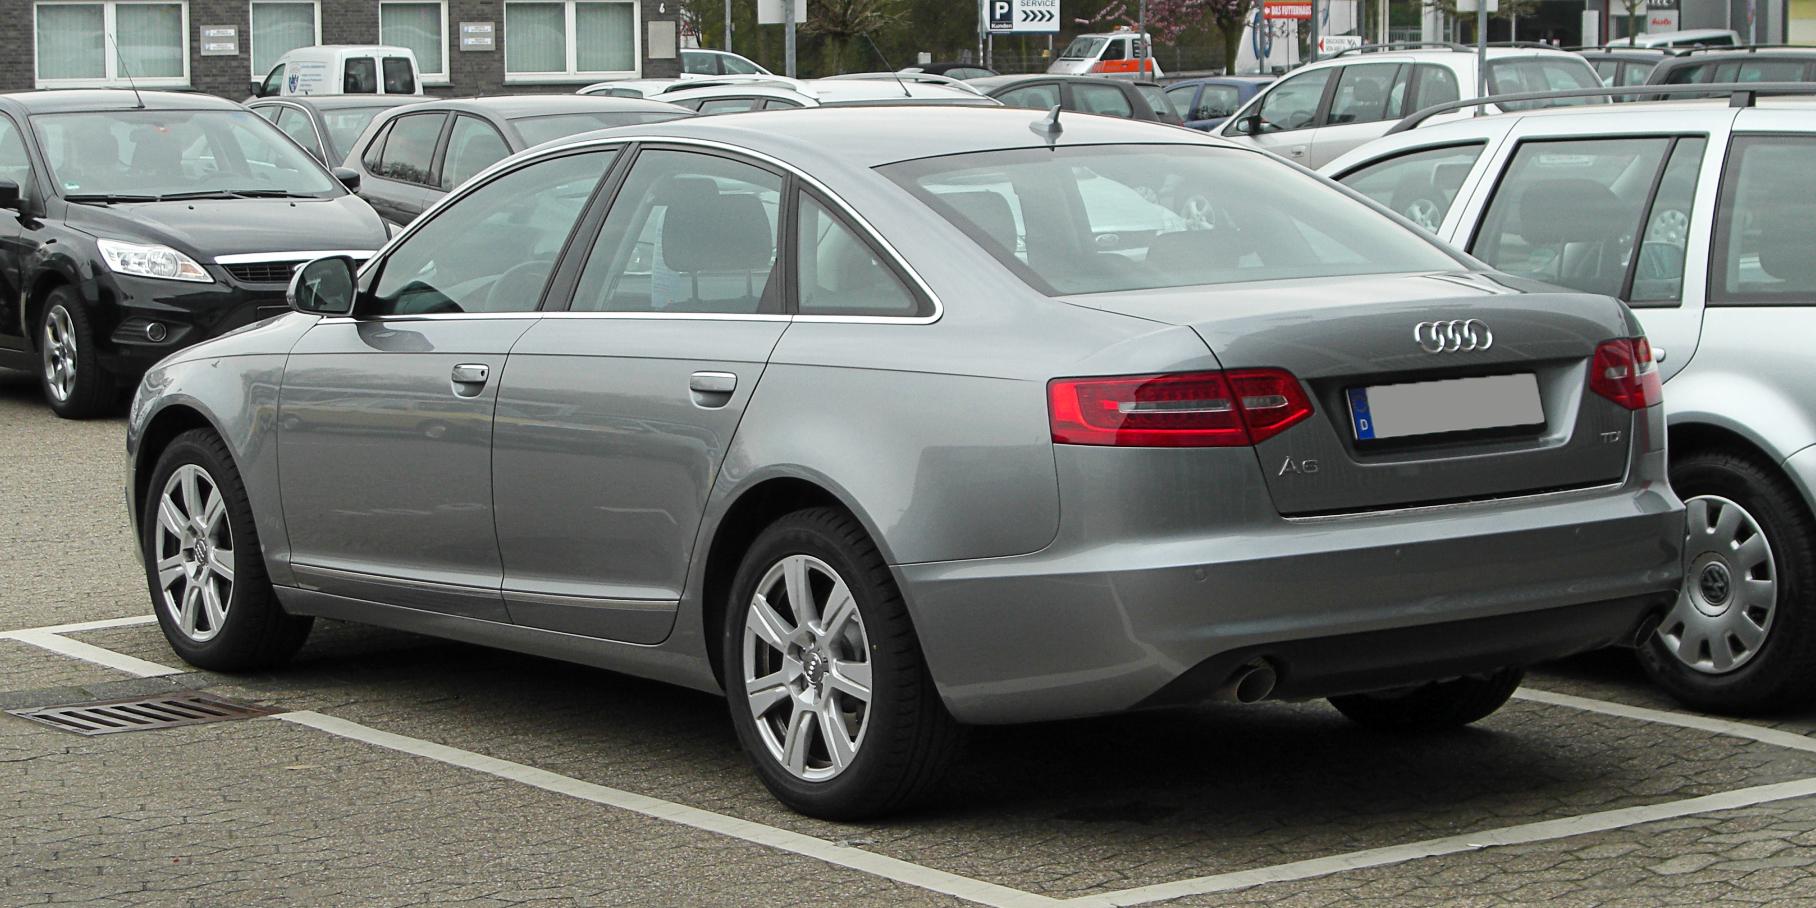 Kekurangan Audi C6 Spesifikasi